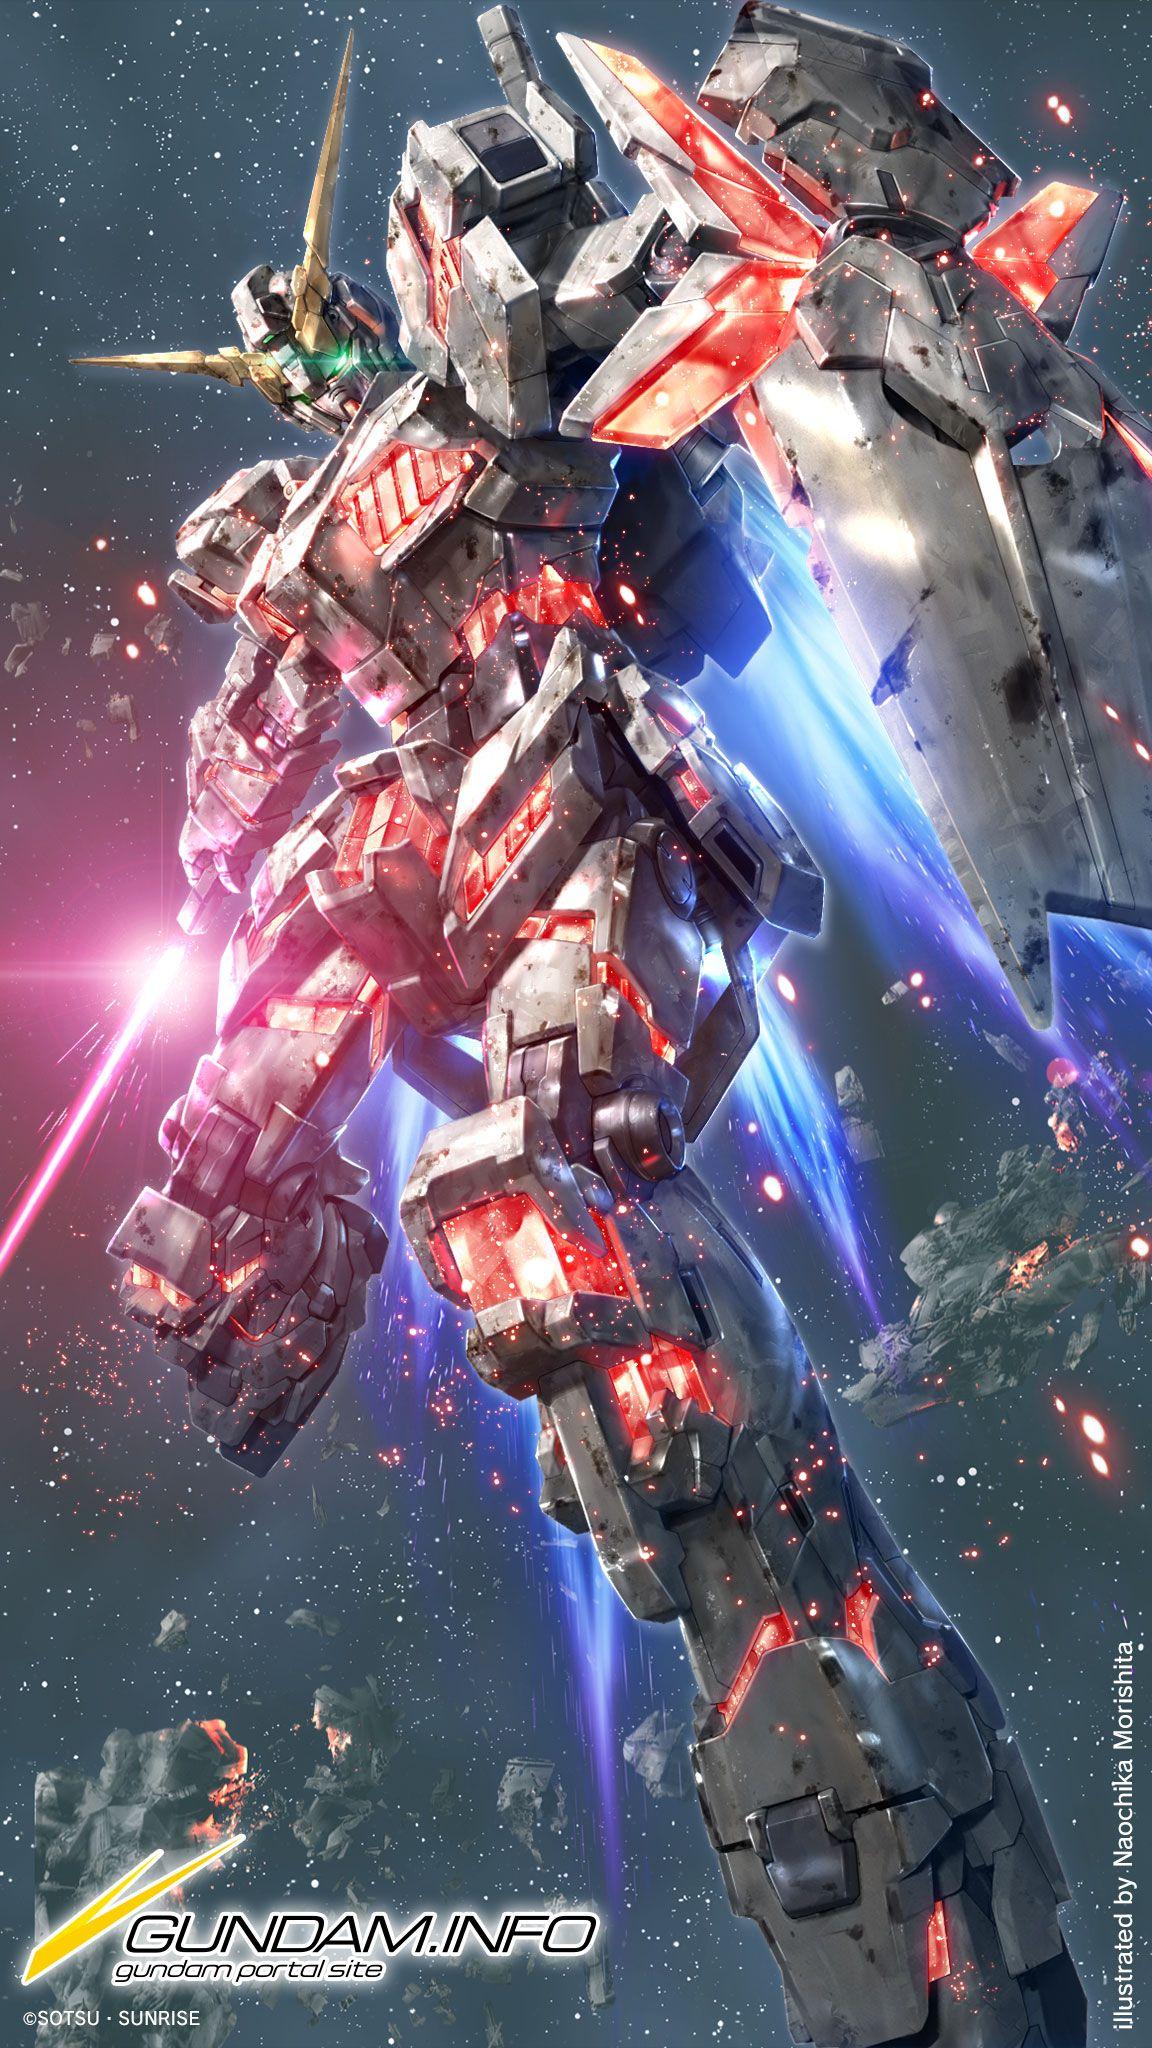 Gundam Uc Art Google Search Gundam Wallpapers Gundam Unicorn Wallpaper